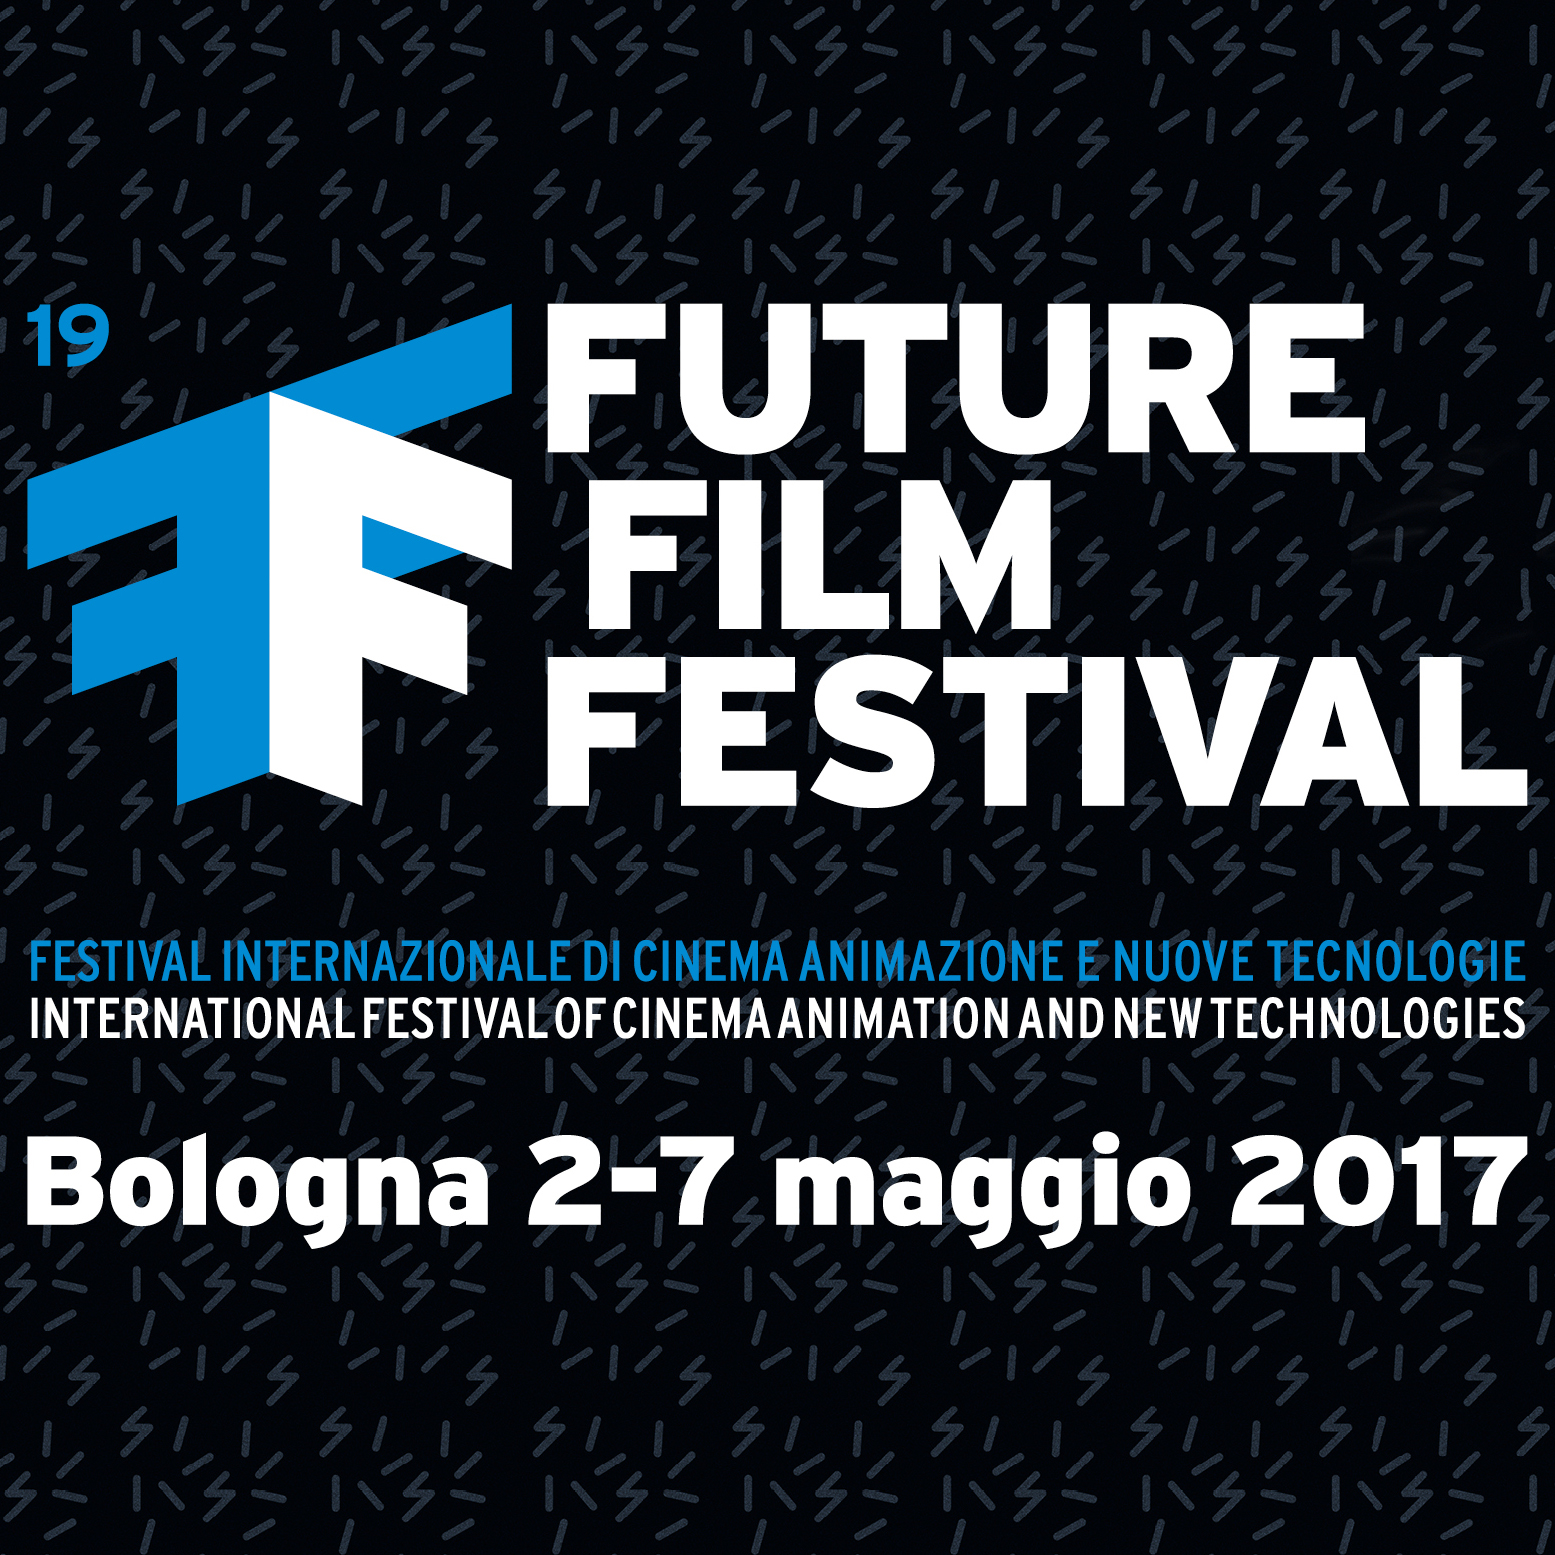 Future Film Festival teaser